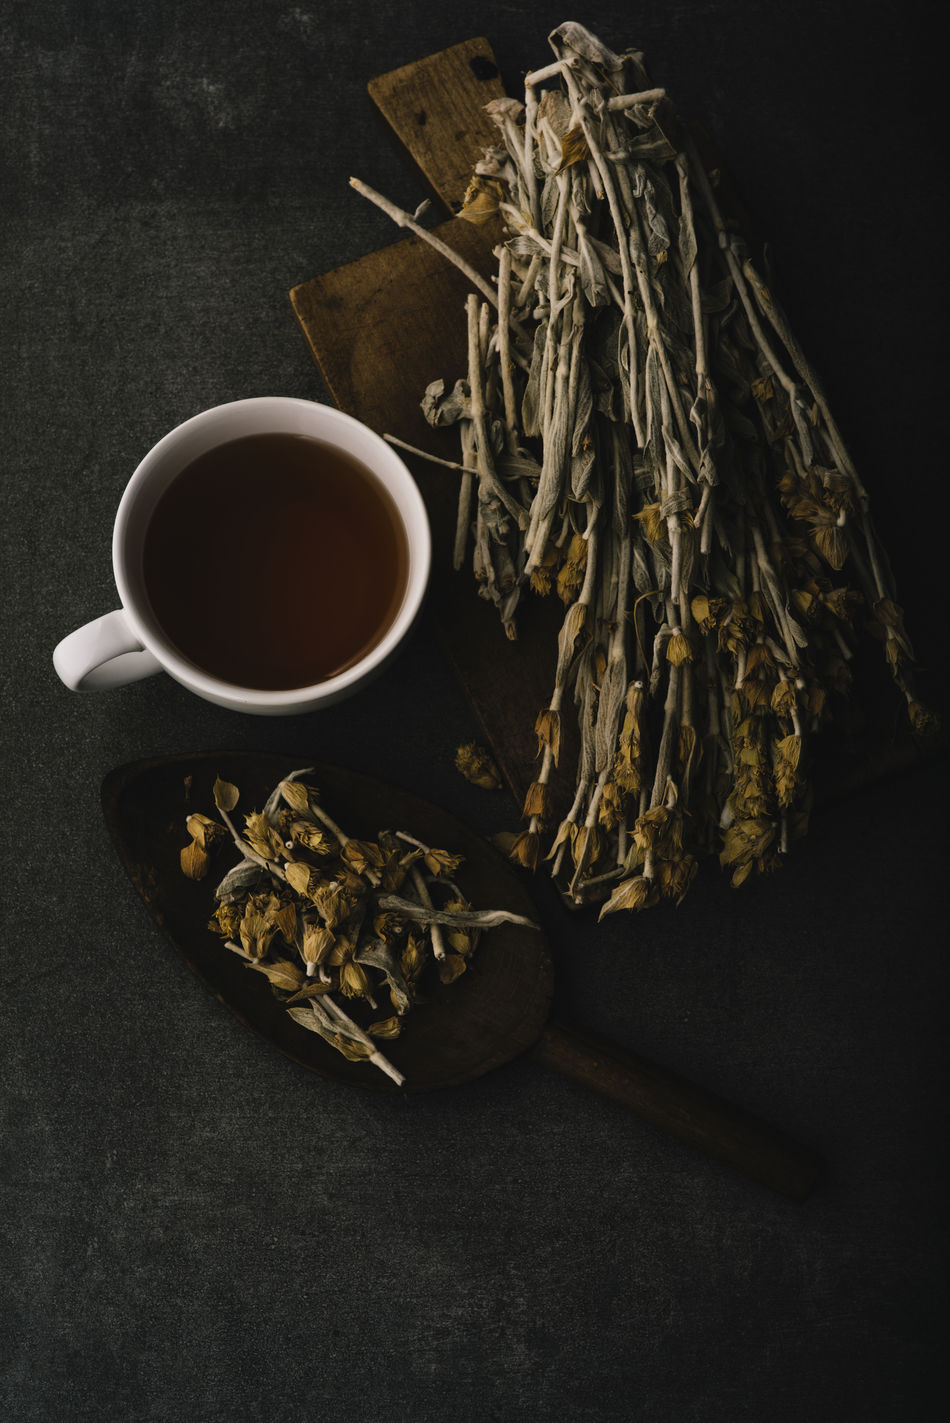 crete mountain tea Crete Crete Greece Cup Drink Dry Leaves Food Fresh Tea Greece, Crete Grey Healthy Lifestyle Herb Ingredients Mountain Tea Stone Material Tea - Hot Drink Teaplants Traditional Wood - Material Wooden Spoon